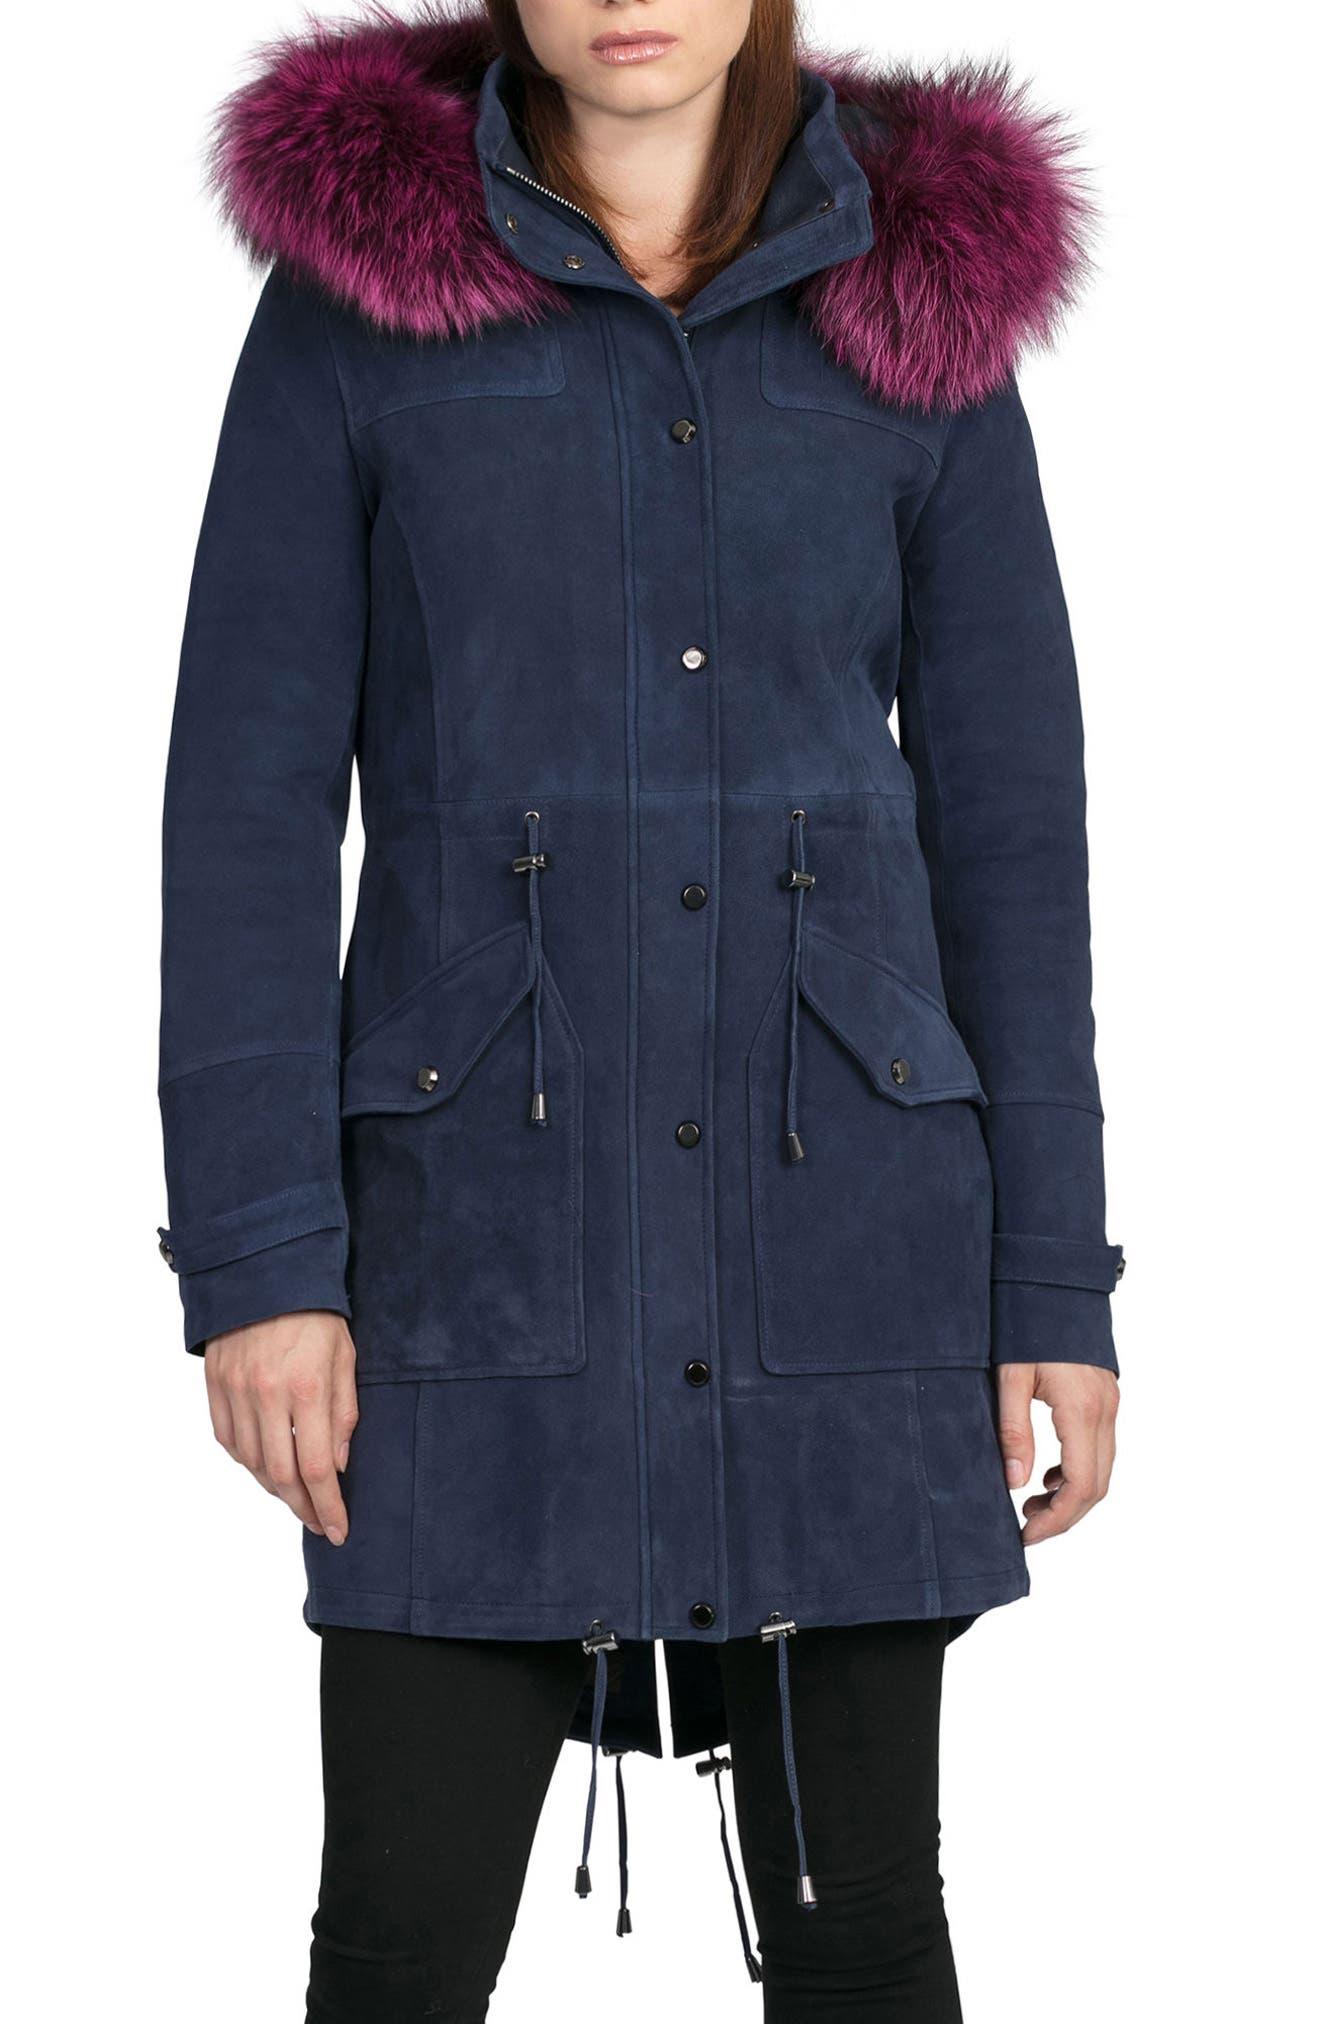 BAGATELLE.CITY The Parka Suede Coat with Genuine Fox Fur Trim,                         Main,                         color, Ink